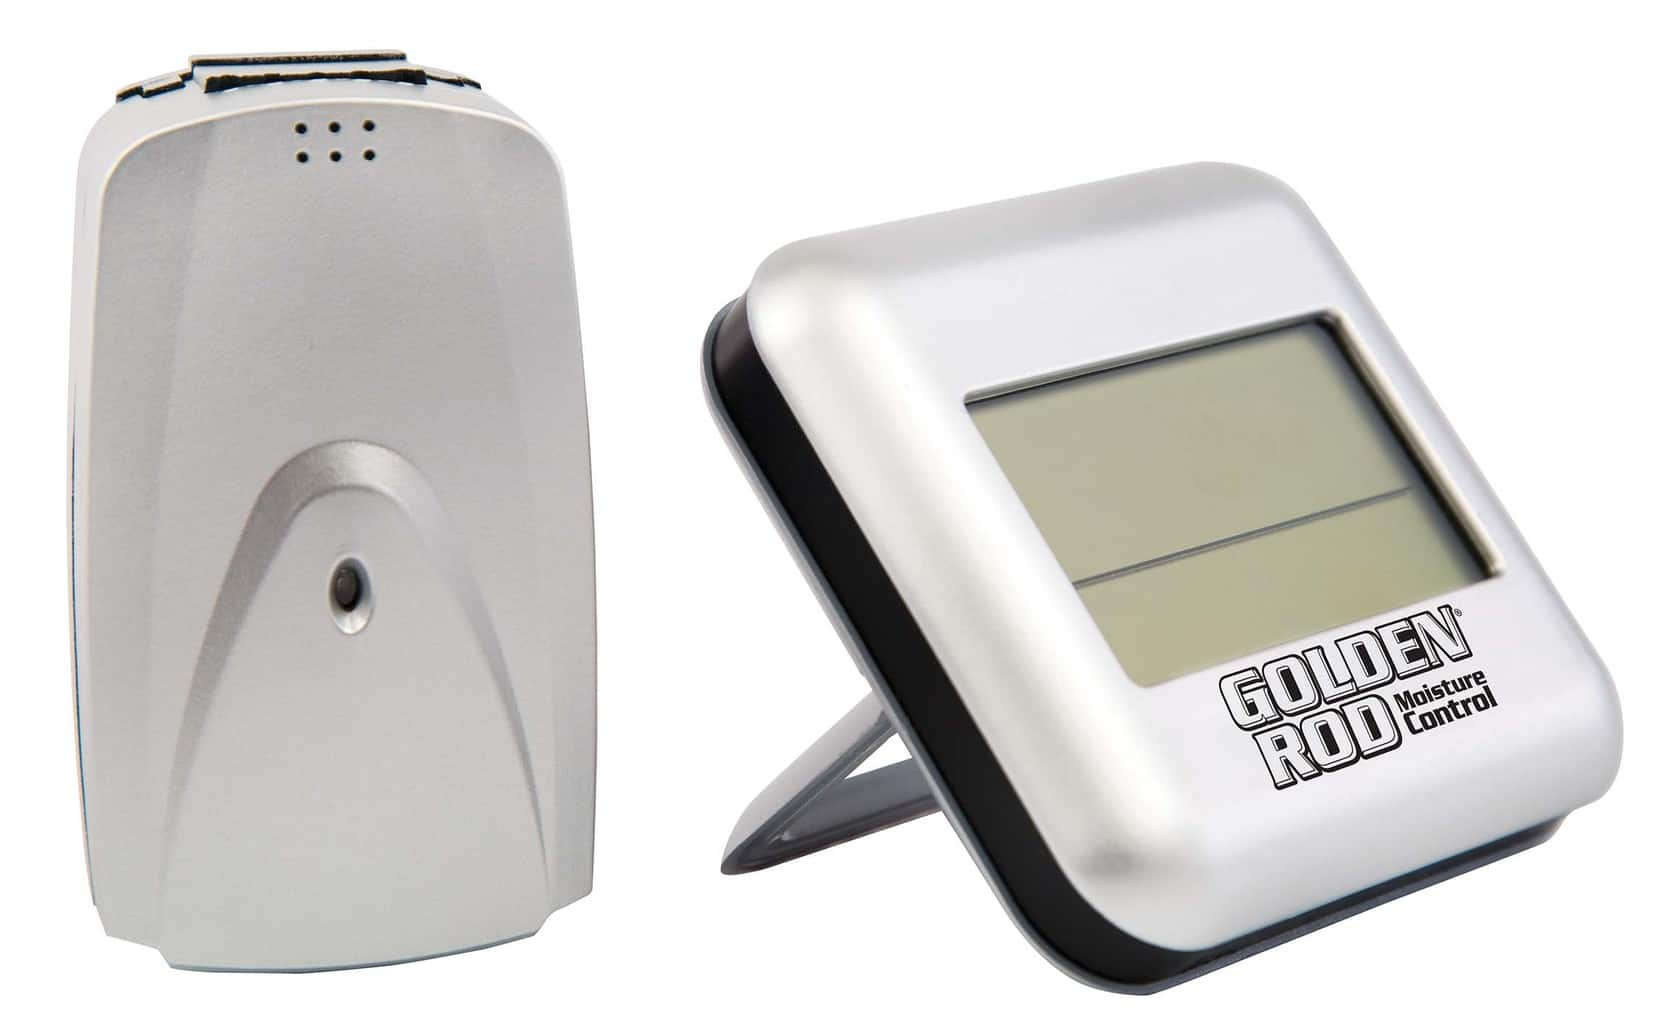 Golden Rod Digital Wireless Hygrometer - 222532 display Standing